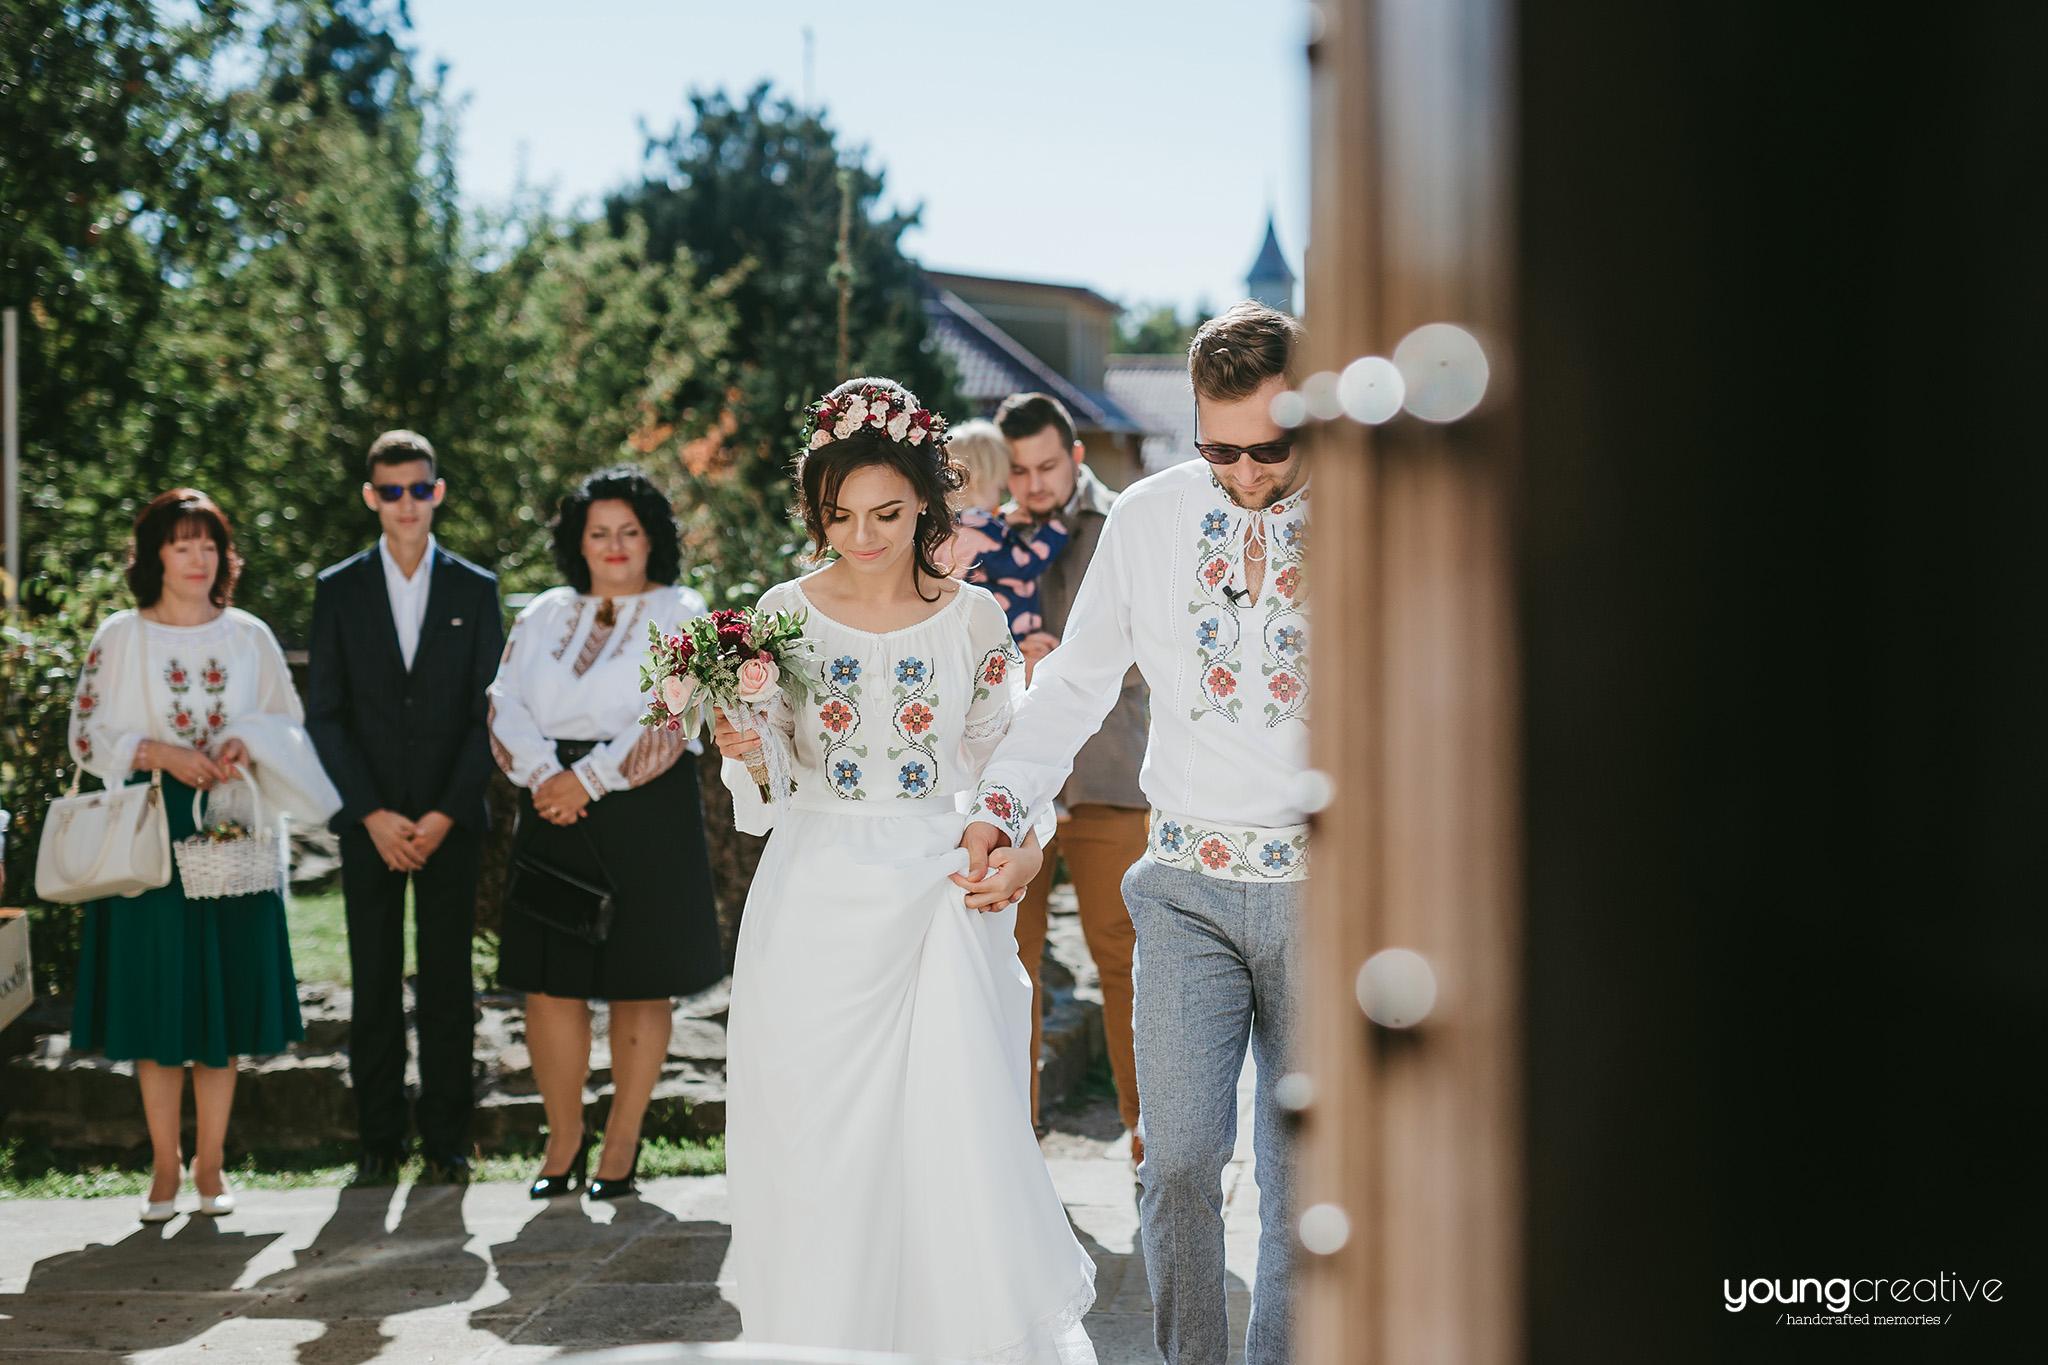 Luminita & Emanuel | youngcreative.info media © Dan Filipciuc, Cristina Bejan | fotografie nunta Suceava